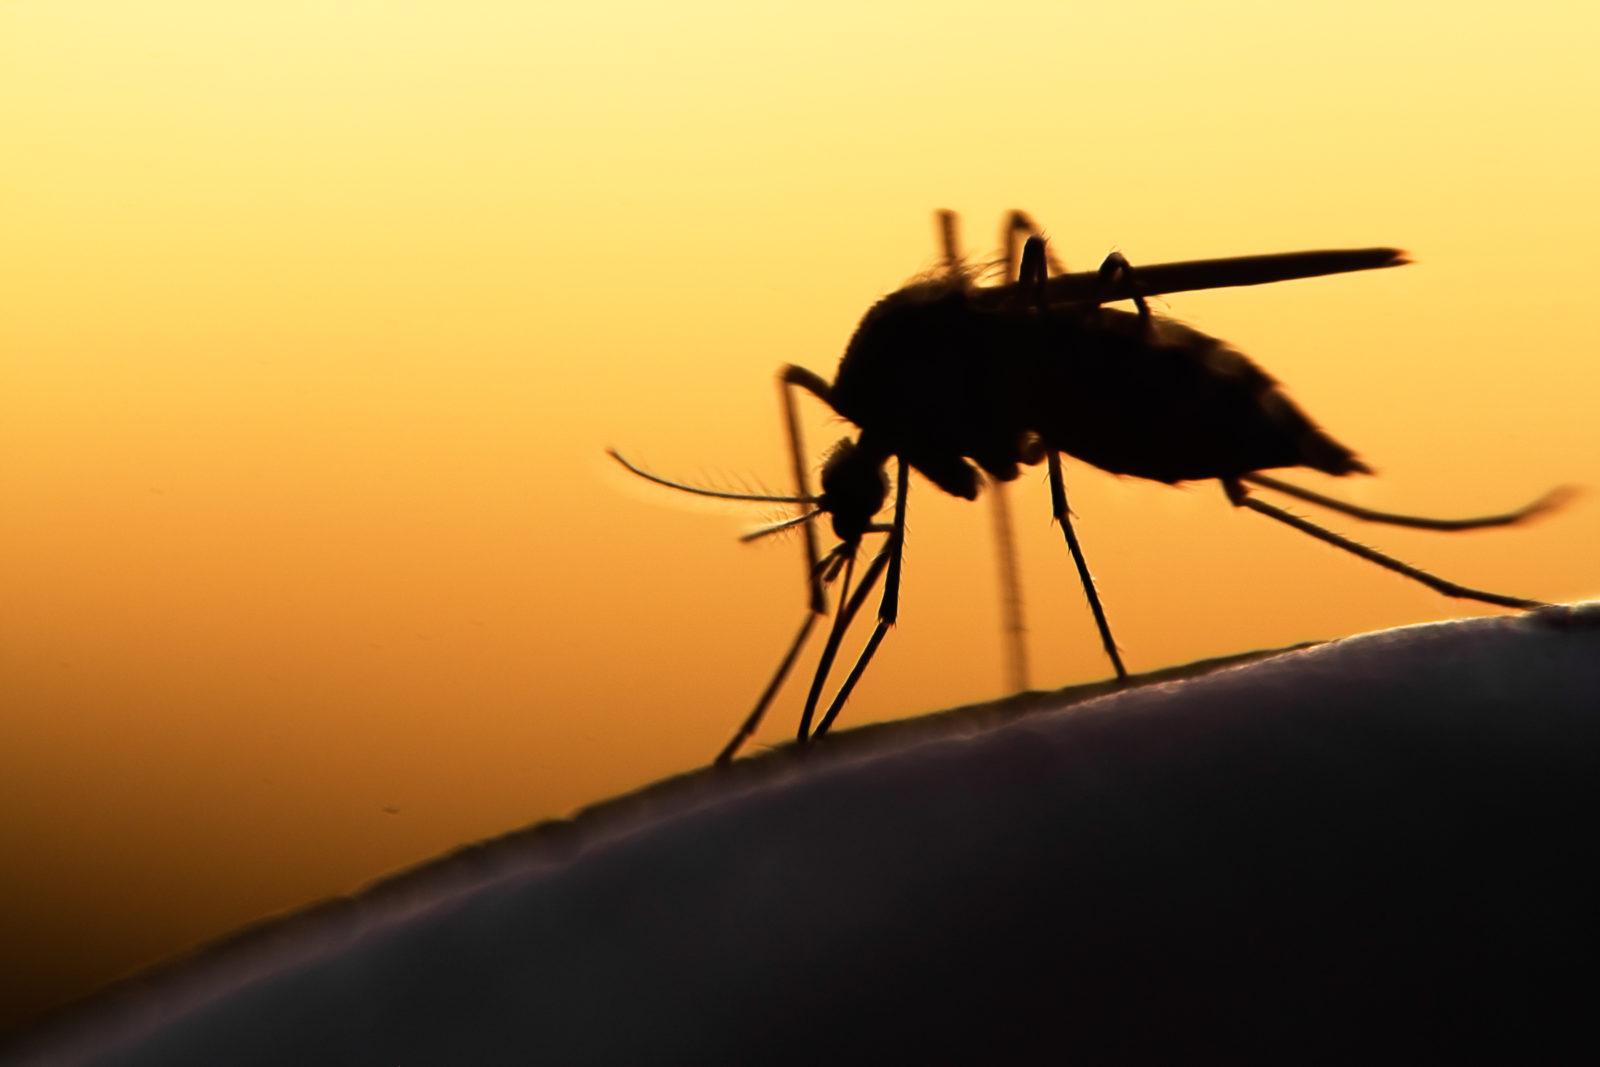 Malaria: Causes, Symptoms and Treatment